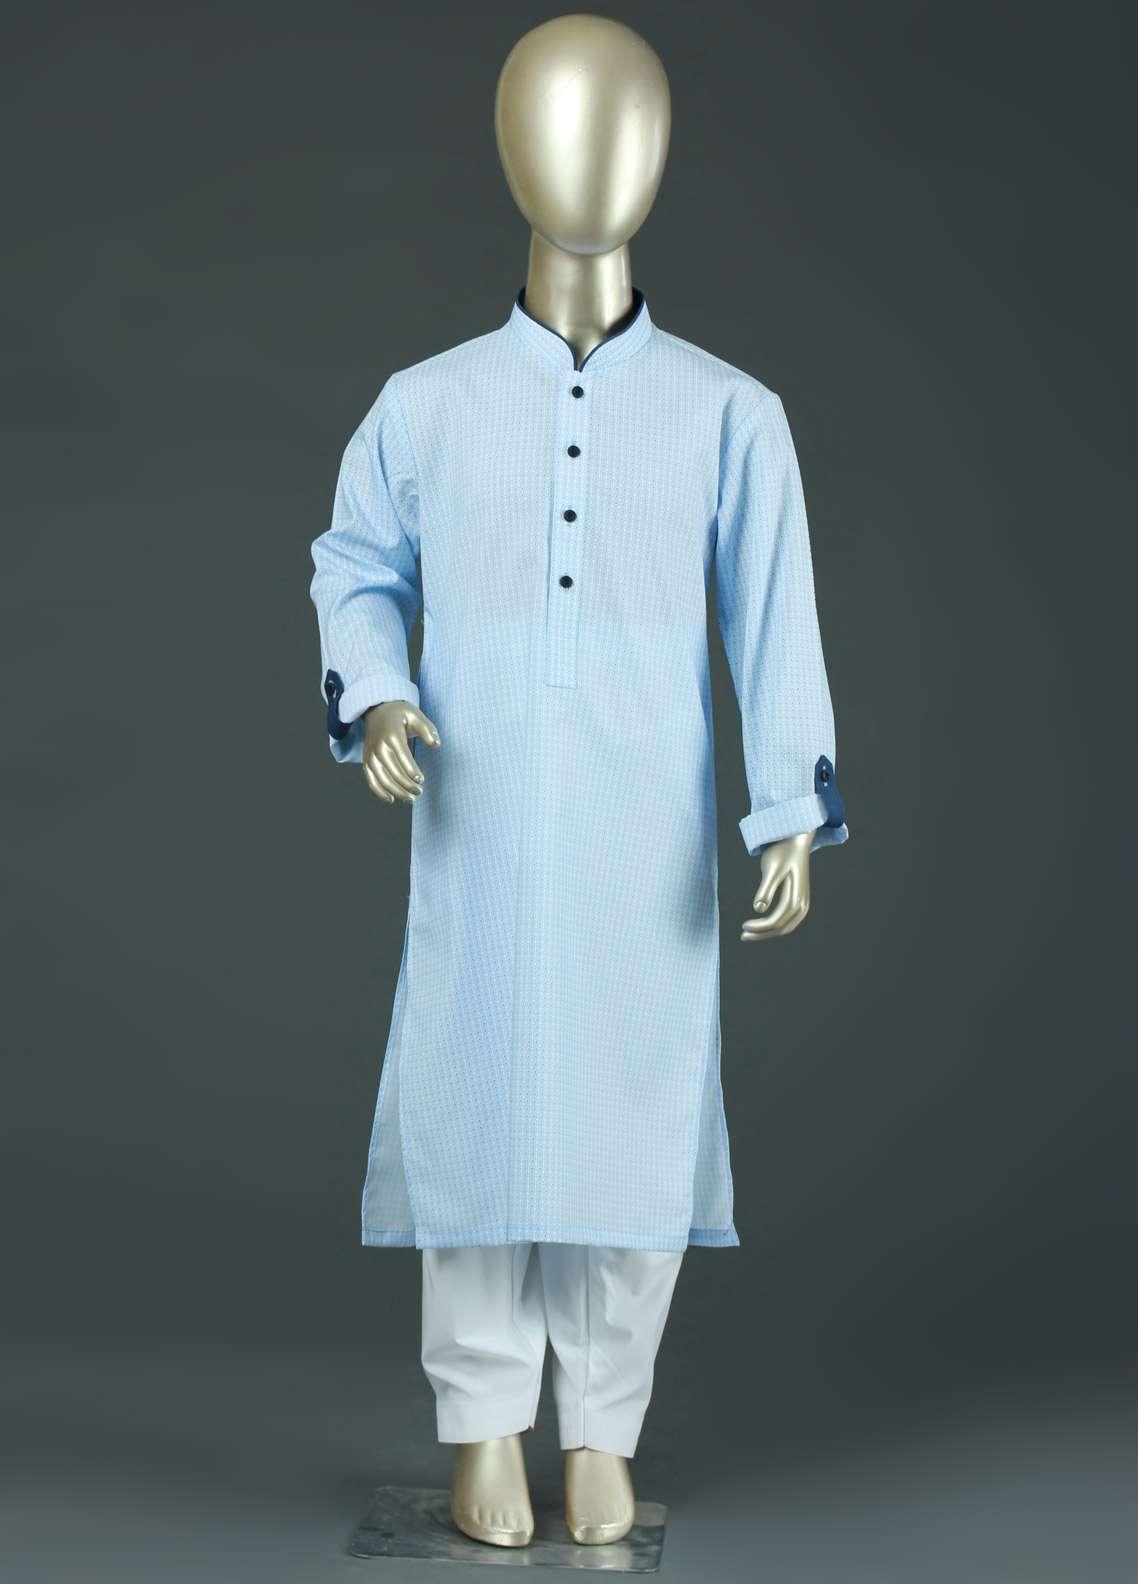 Aizaz Zafar Cotton Formal Boys Kurtas -  AZ19B 220 Sky Blue